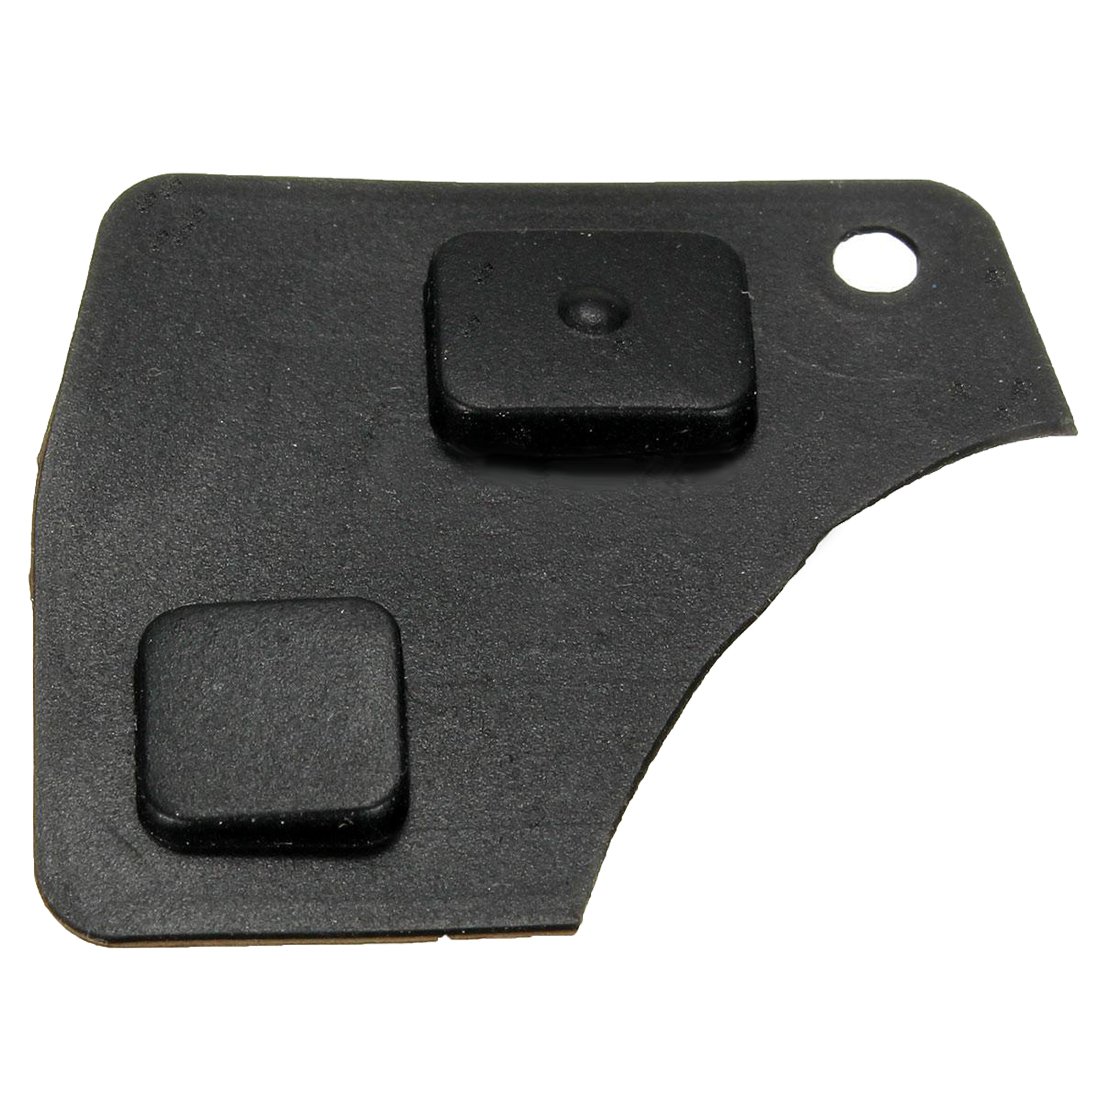 2 Keys Rubber Button Key Remote Control For Toyota Yaris Rav4 Corolla Mr2 Celica2 Keys Rubber Button Key Remote Control For Toyota Yaris Rav4 Corolla Mr2 Celica